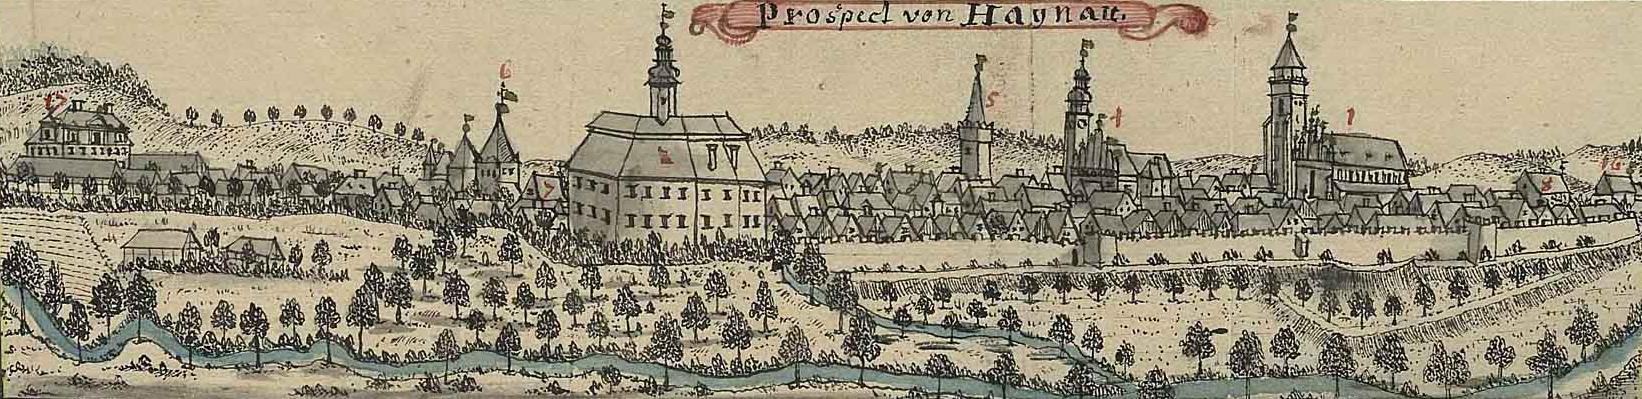 Panorama Chojnowa autorstwa Friedricha Bernharda Wernhera z Topographia oder Prodromus Delineati Principatus Lignicensis Bregensis, et Wolaviensis [...] (XVIII wiek)